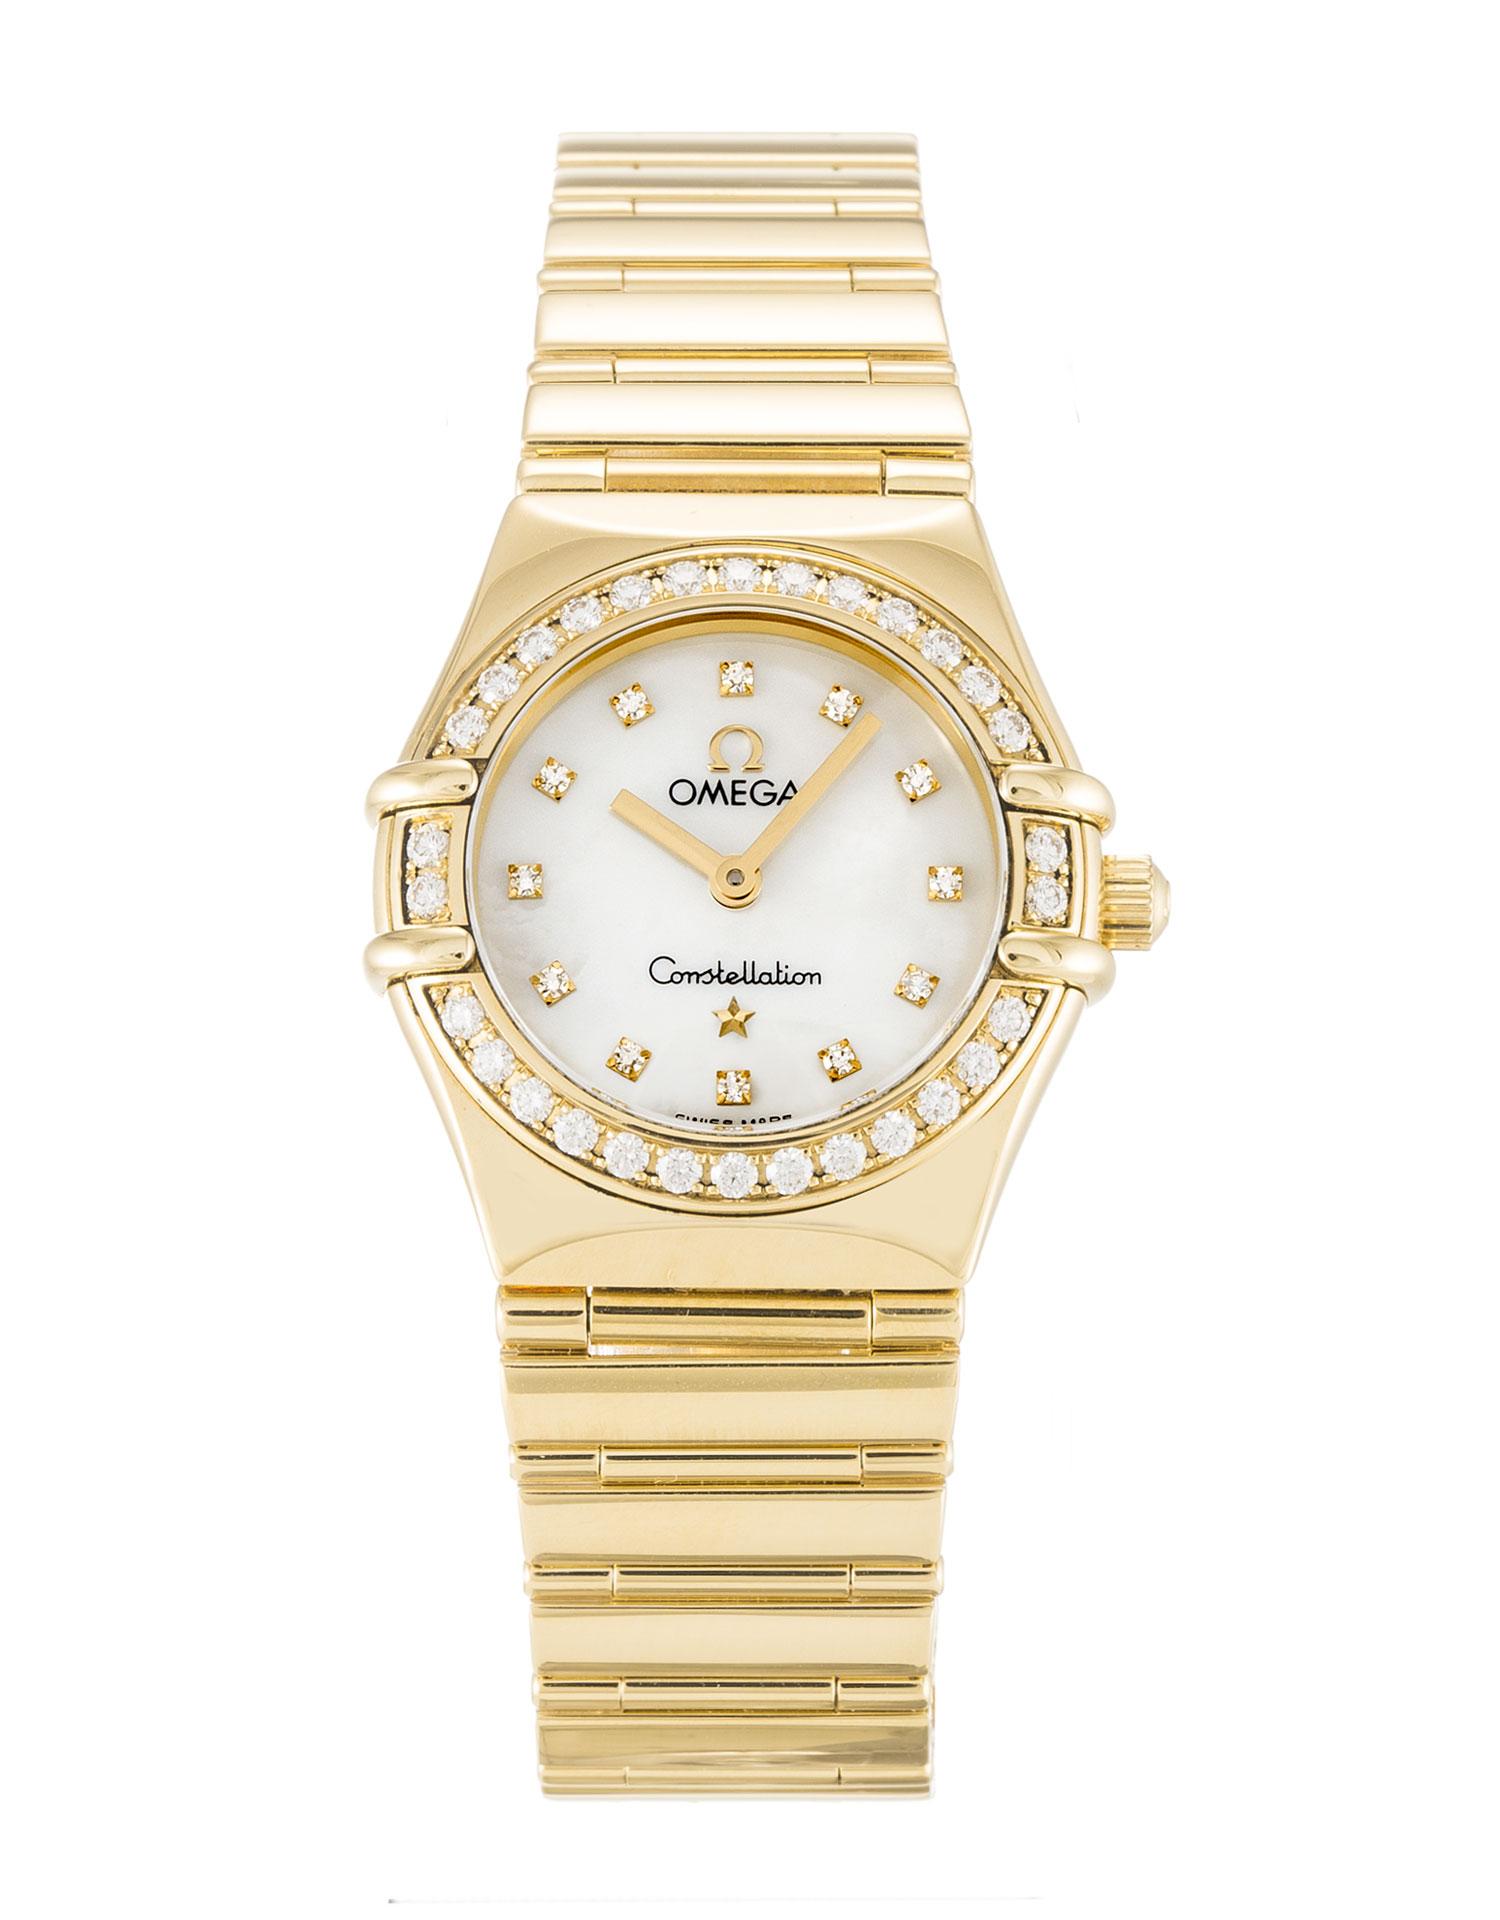 Omega My Choice Mini 1164.75.00 Ladies 22.5 Mm Yellow Gold Set With Diamonds Case Quartz Movement – iapac.to